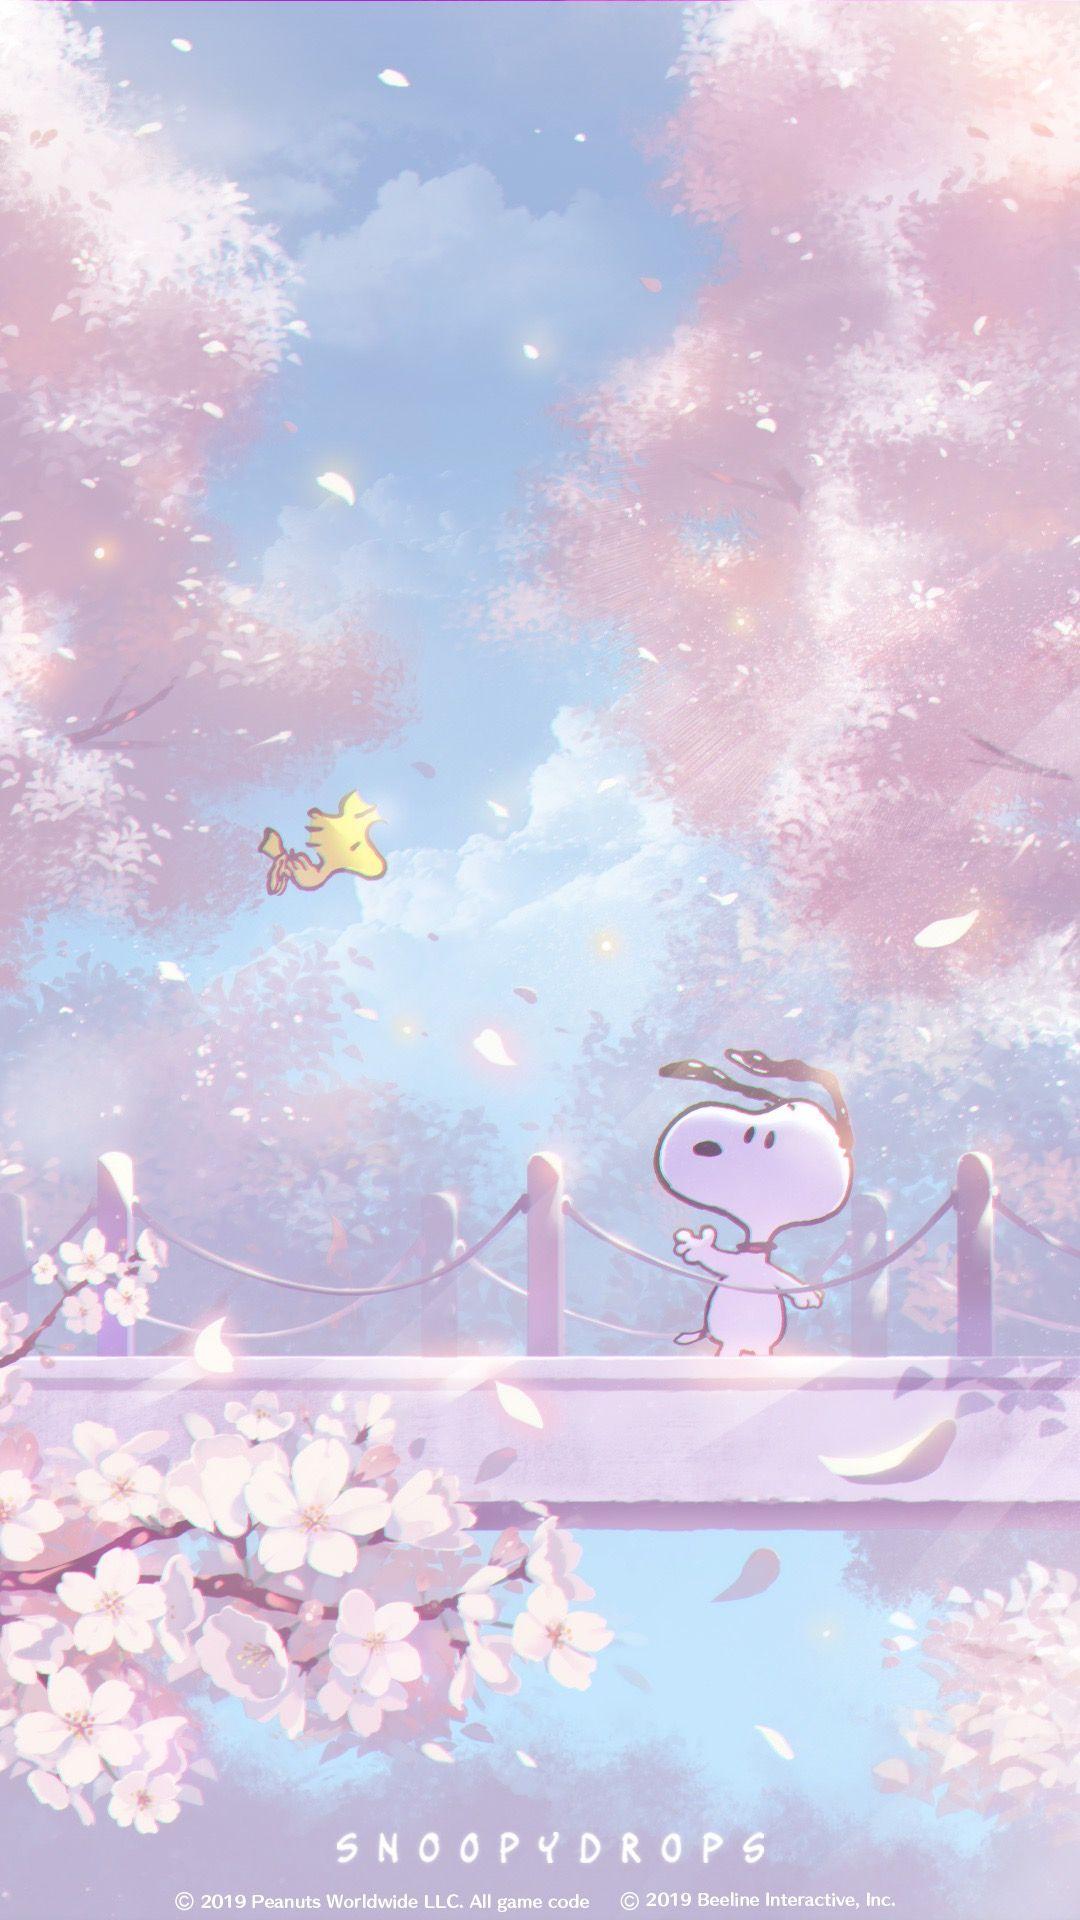 Snoopy スヌーピー 桜の思い出 桜 壁紙 スヌーピーの壁紙